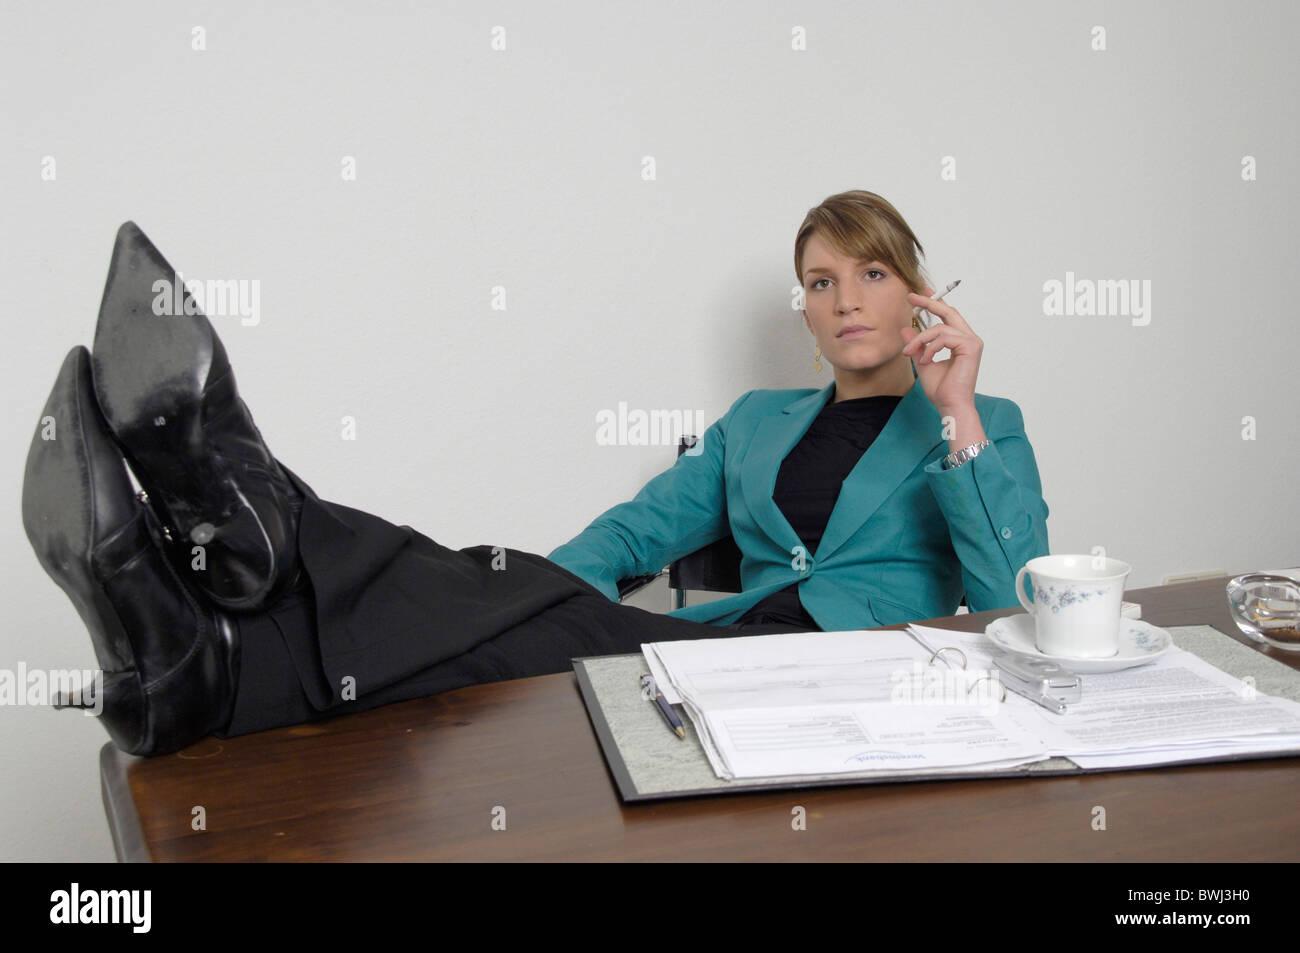 Woman Office Employees Smokings Smoking Relax Cigarette